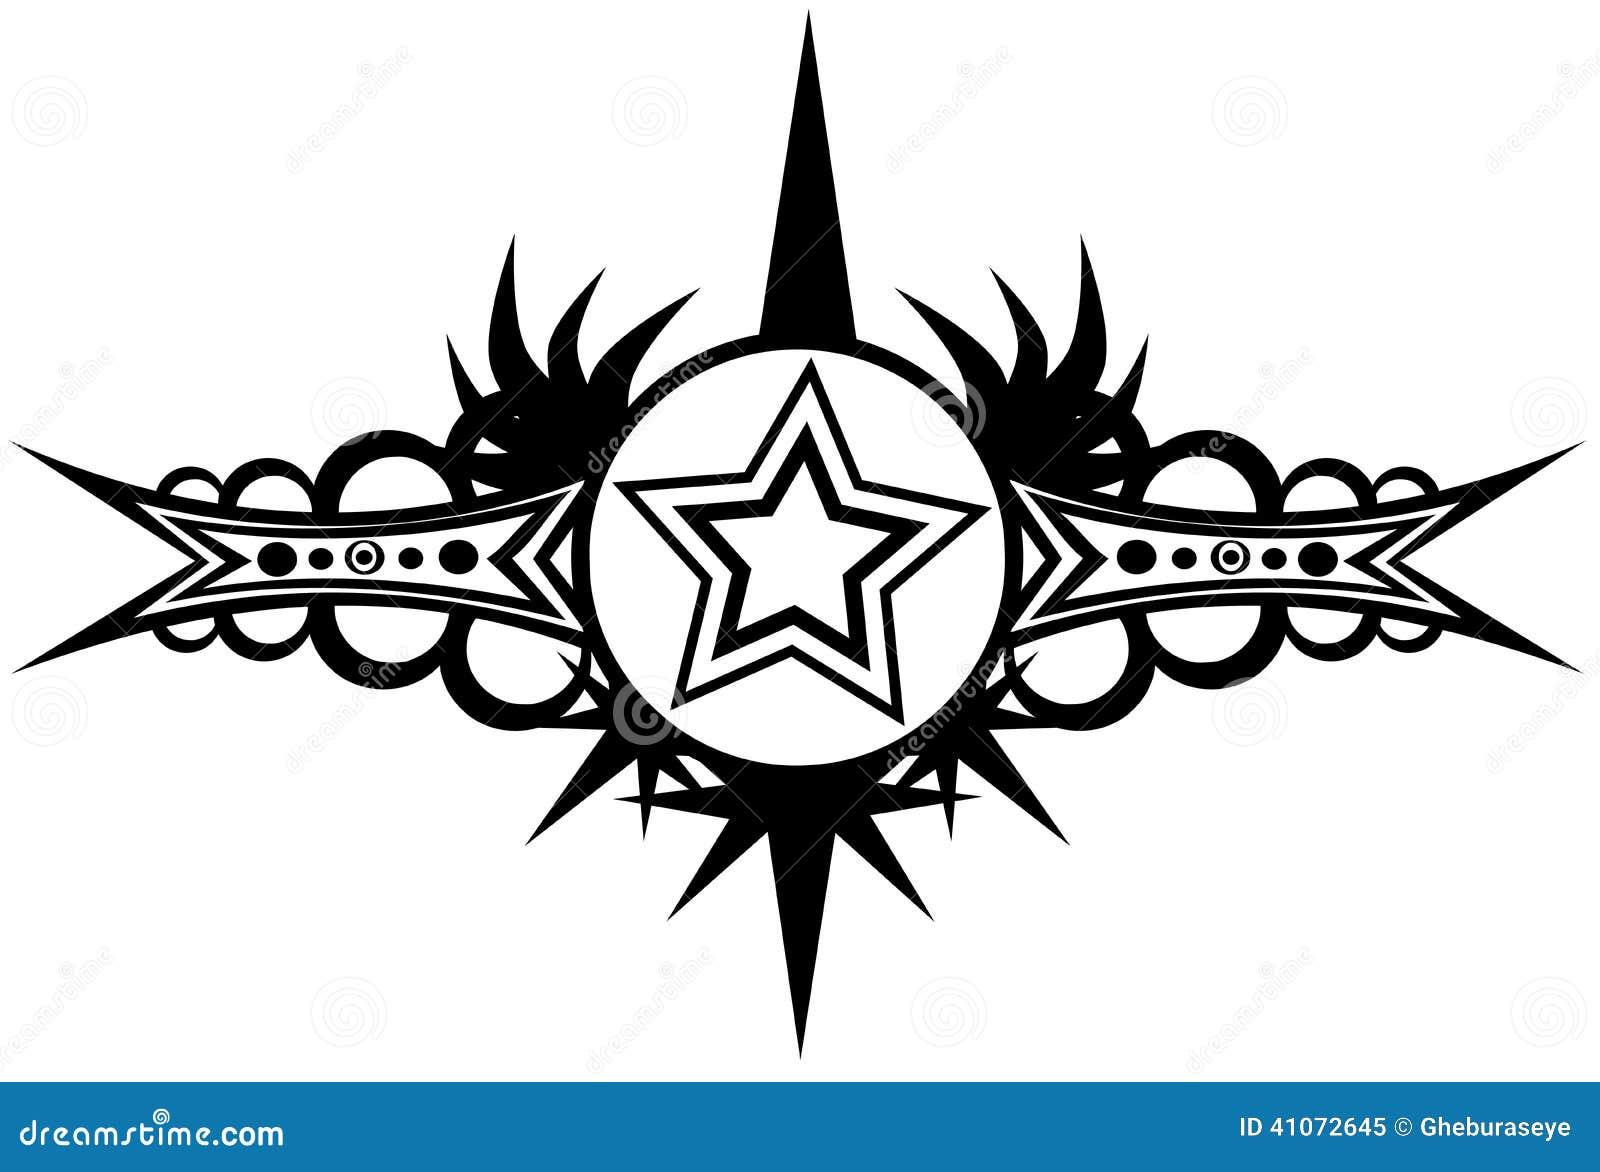 Star tattoo in black and white stock illustration image 41072645 - Dibujos tribales para tatuar ...